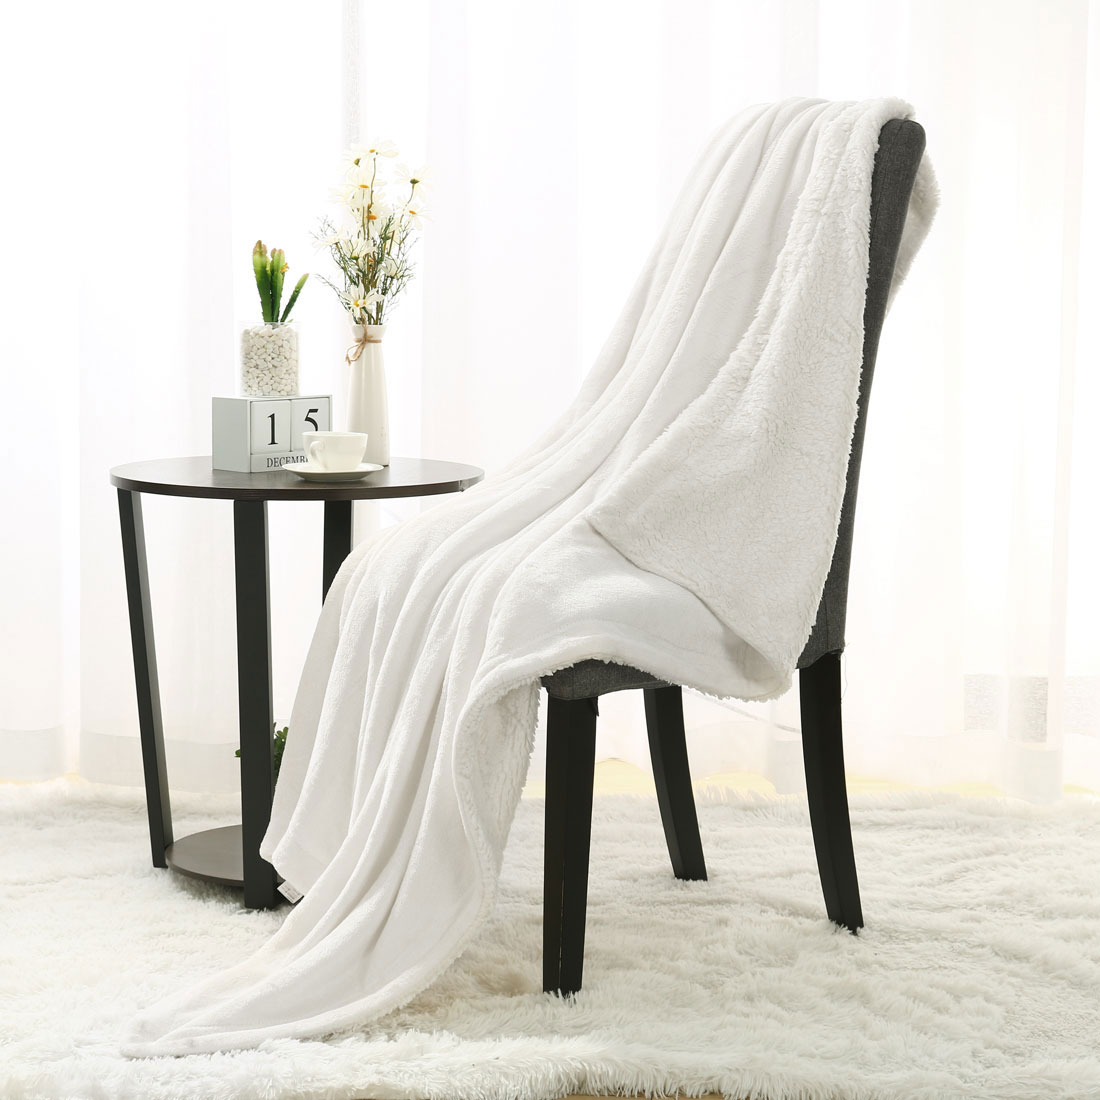 "Fleece Throw Blanket 50""x60"" Soft Plush Flannel Blanket, Navy Blue+White"